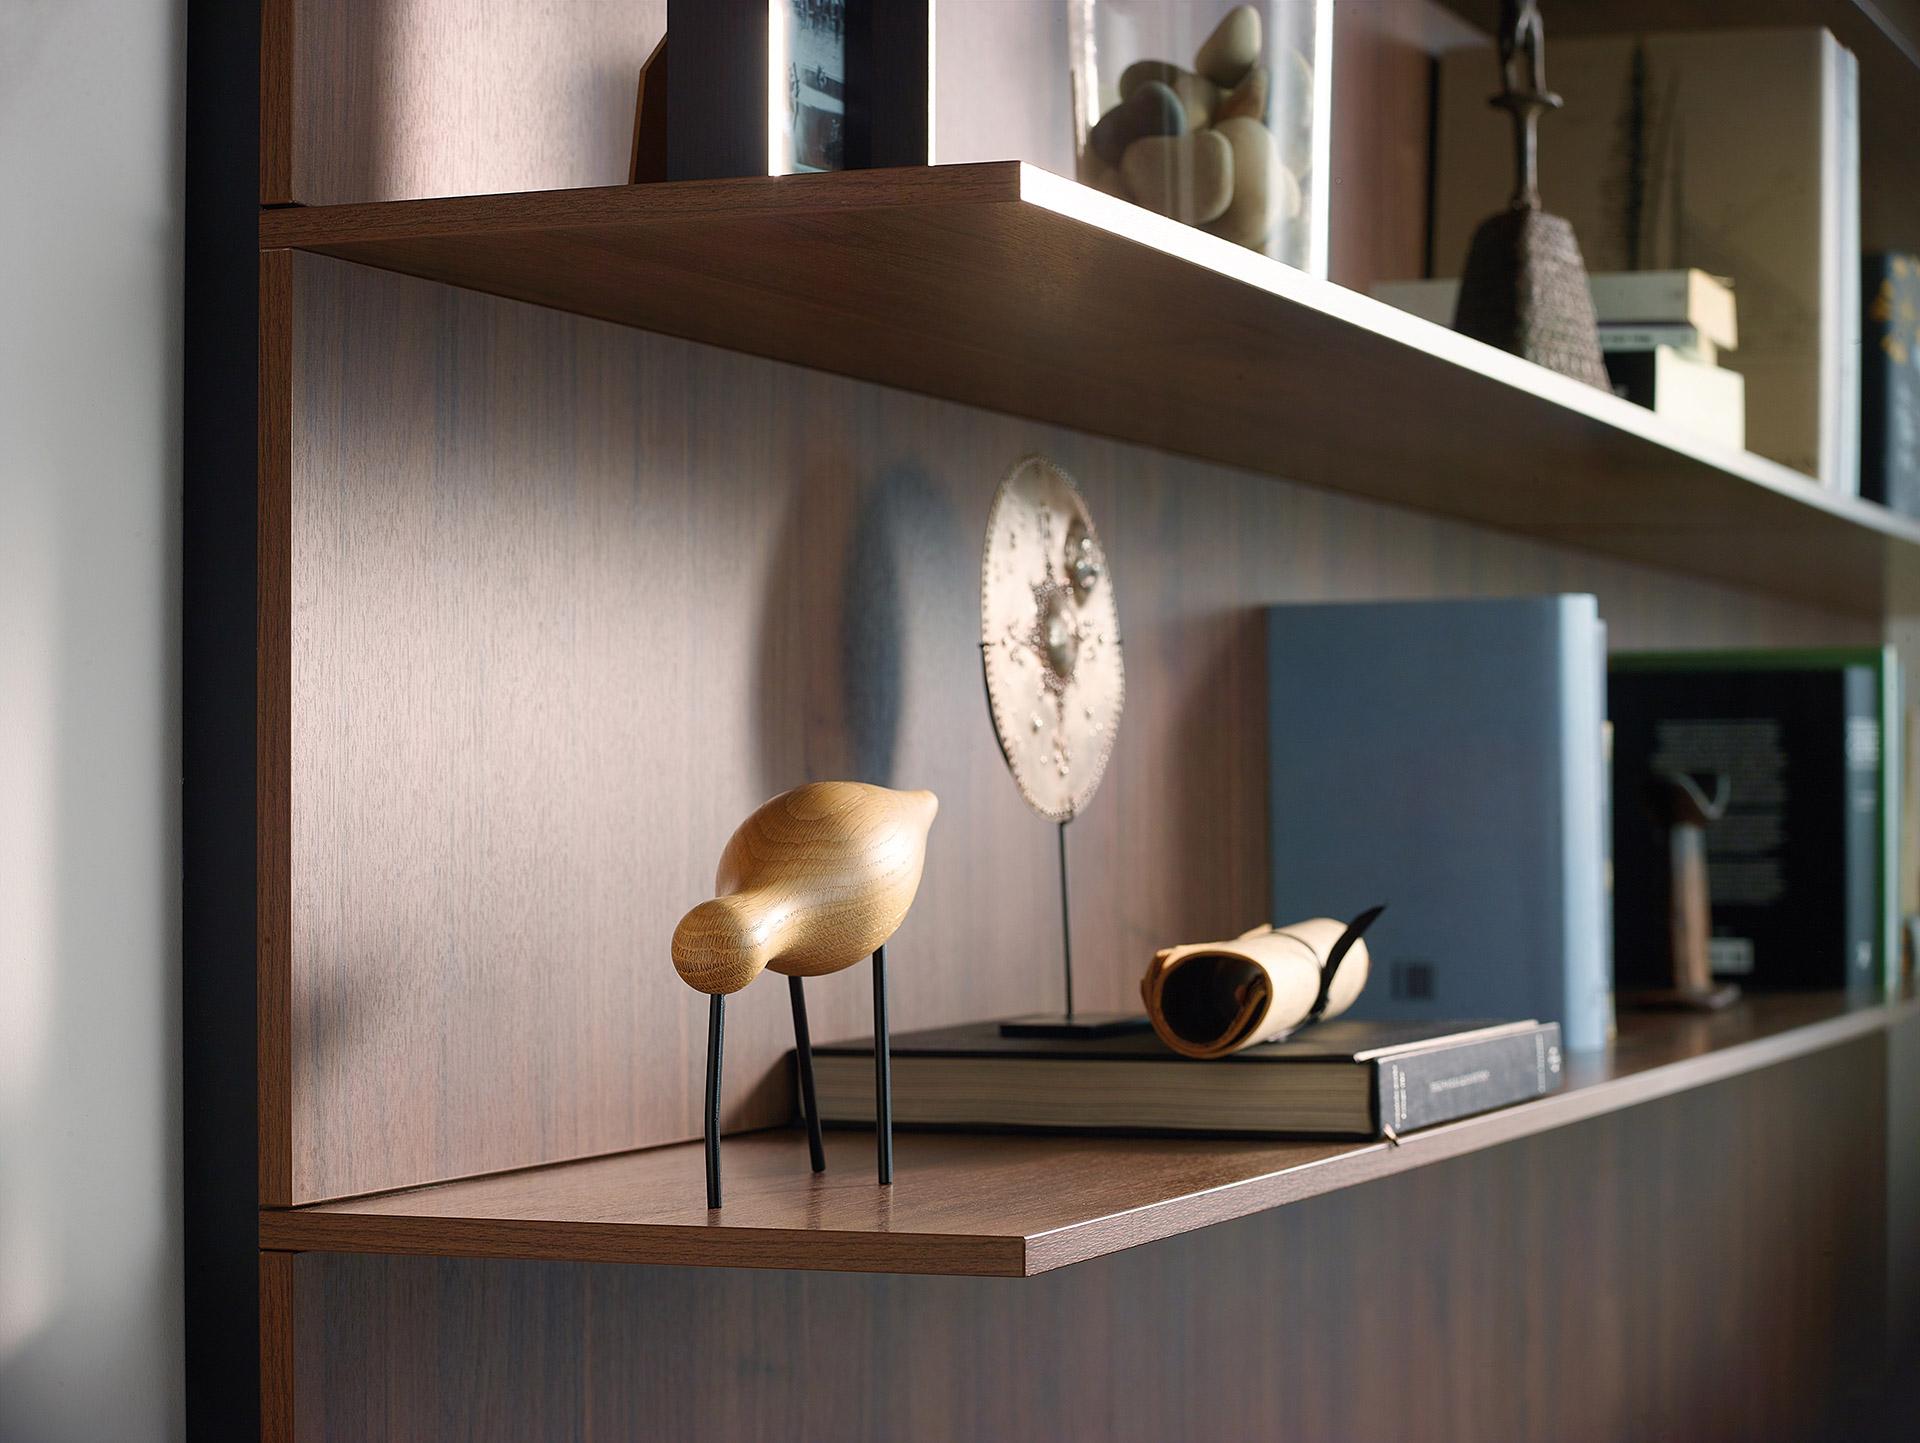 Muebles de Hogar en Santiago Interiores. Detalle Estantería